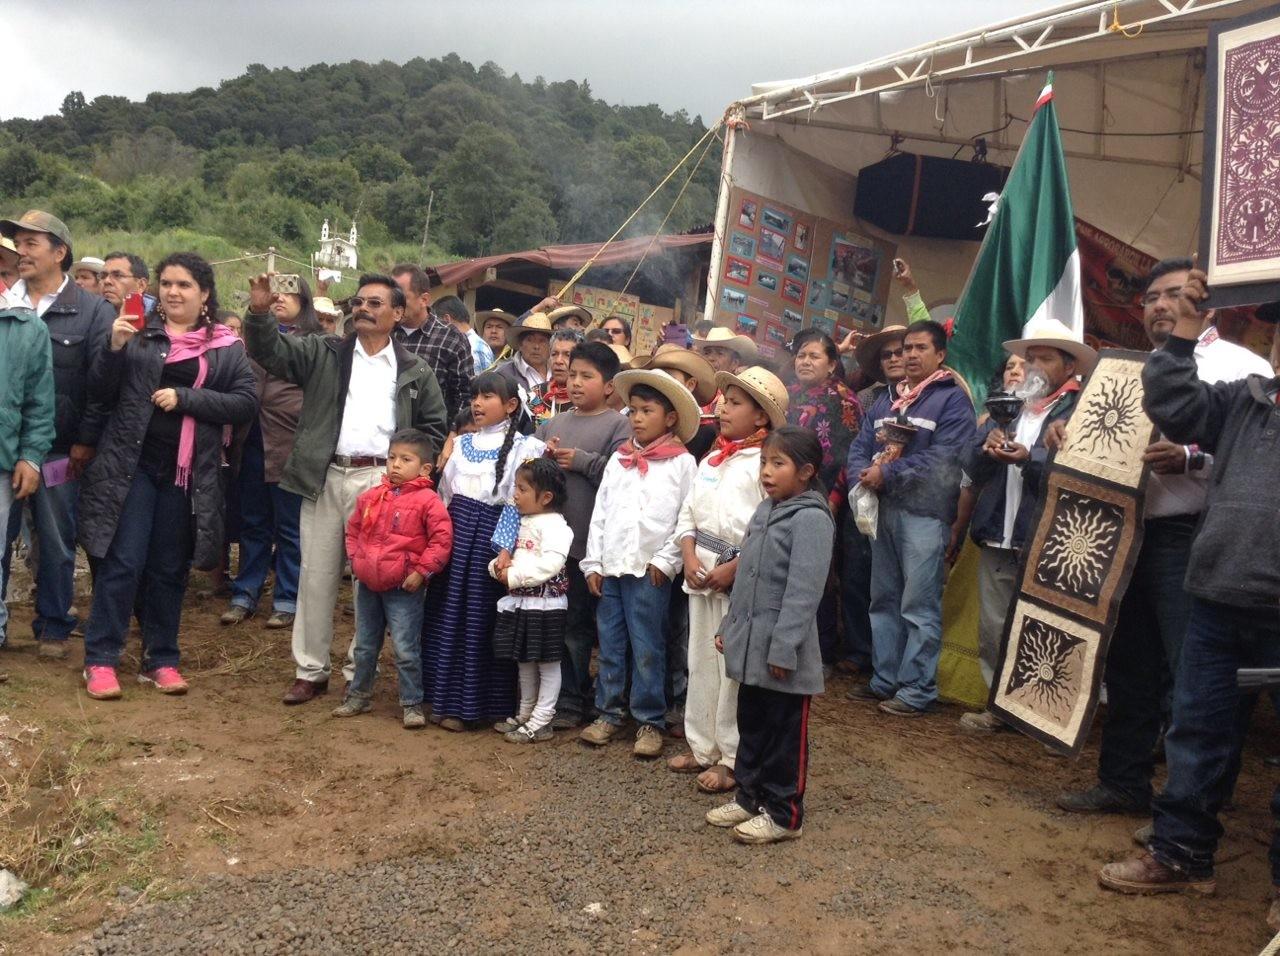 Trescientos niños de Xochicuautla serían afectados directamente por autopista.